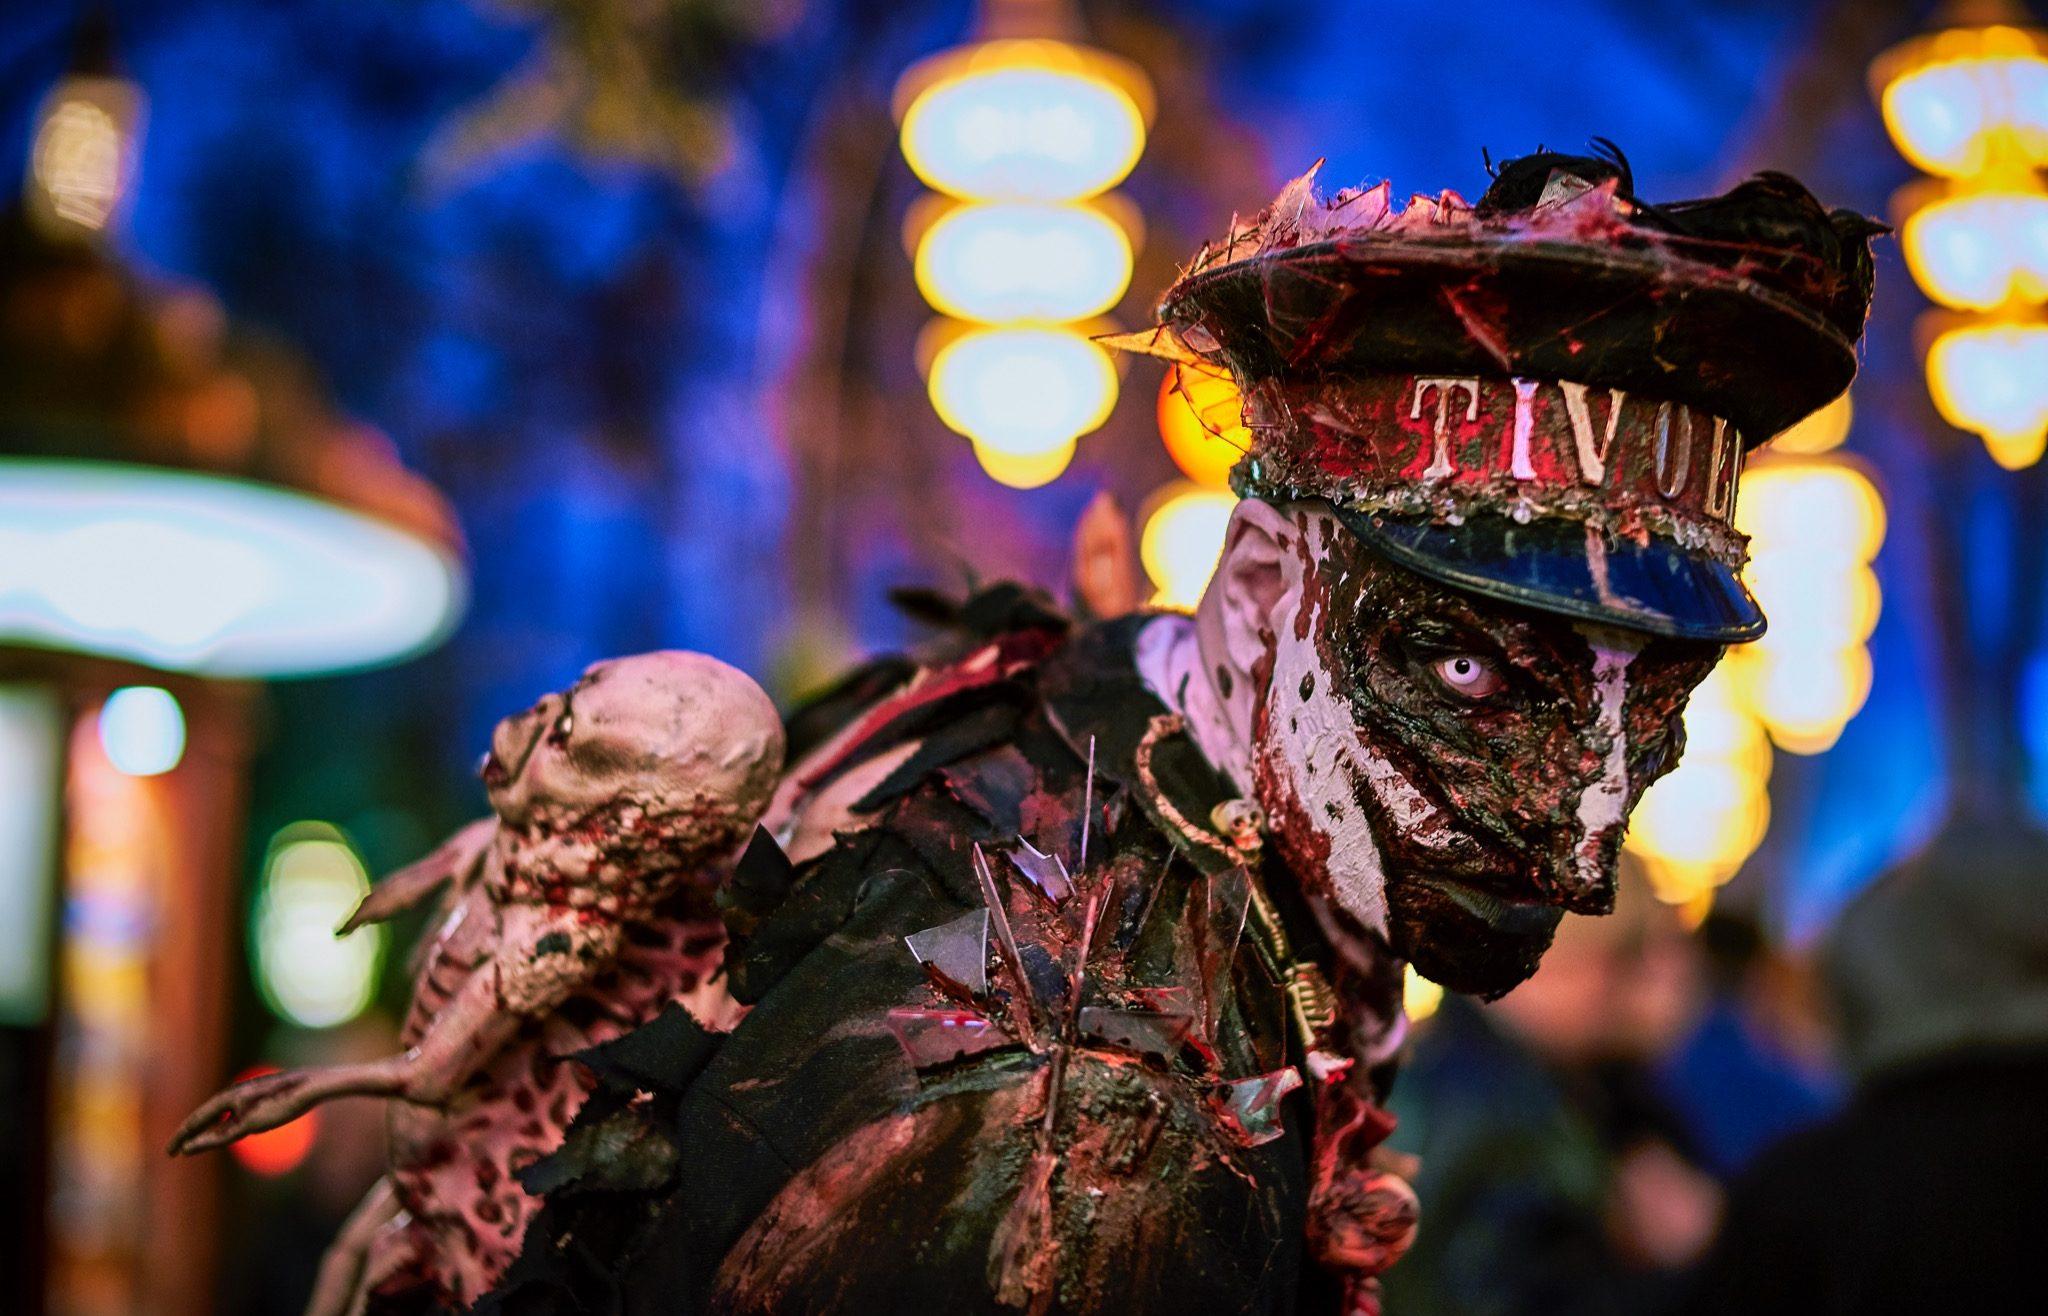 Halloween i Tivoli 2016. Scary Kontrollør Aften